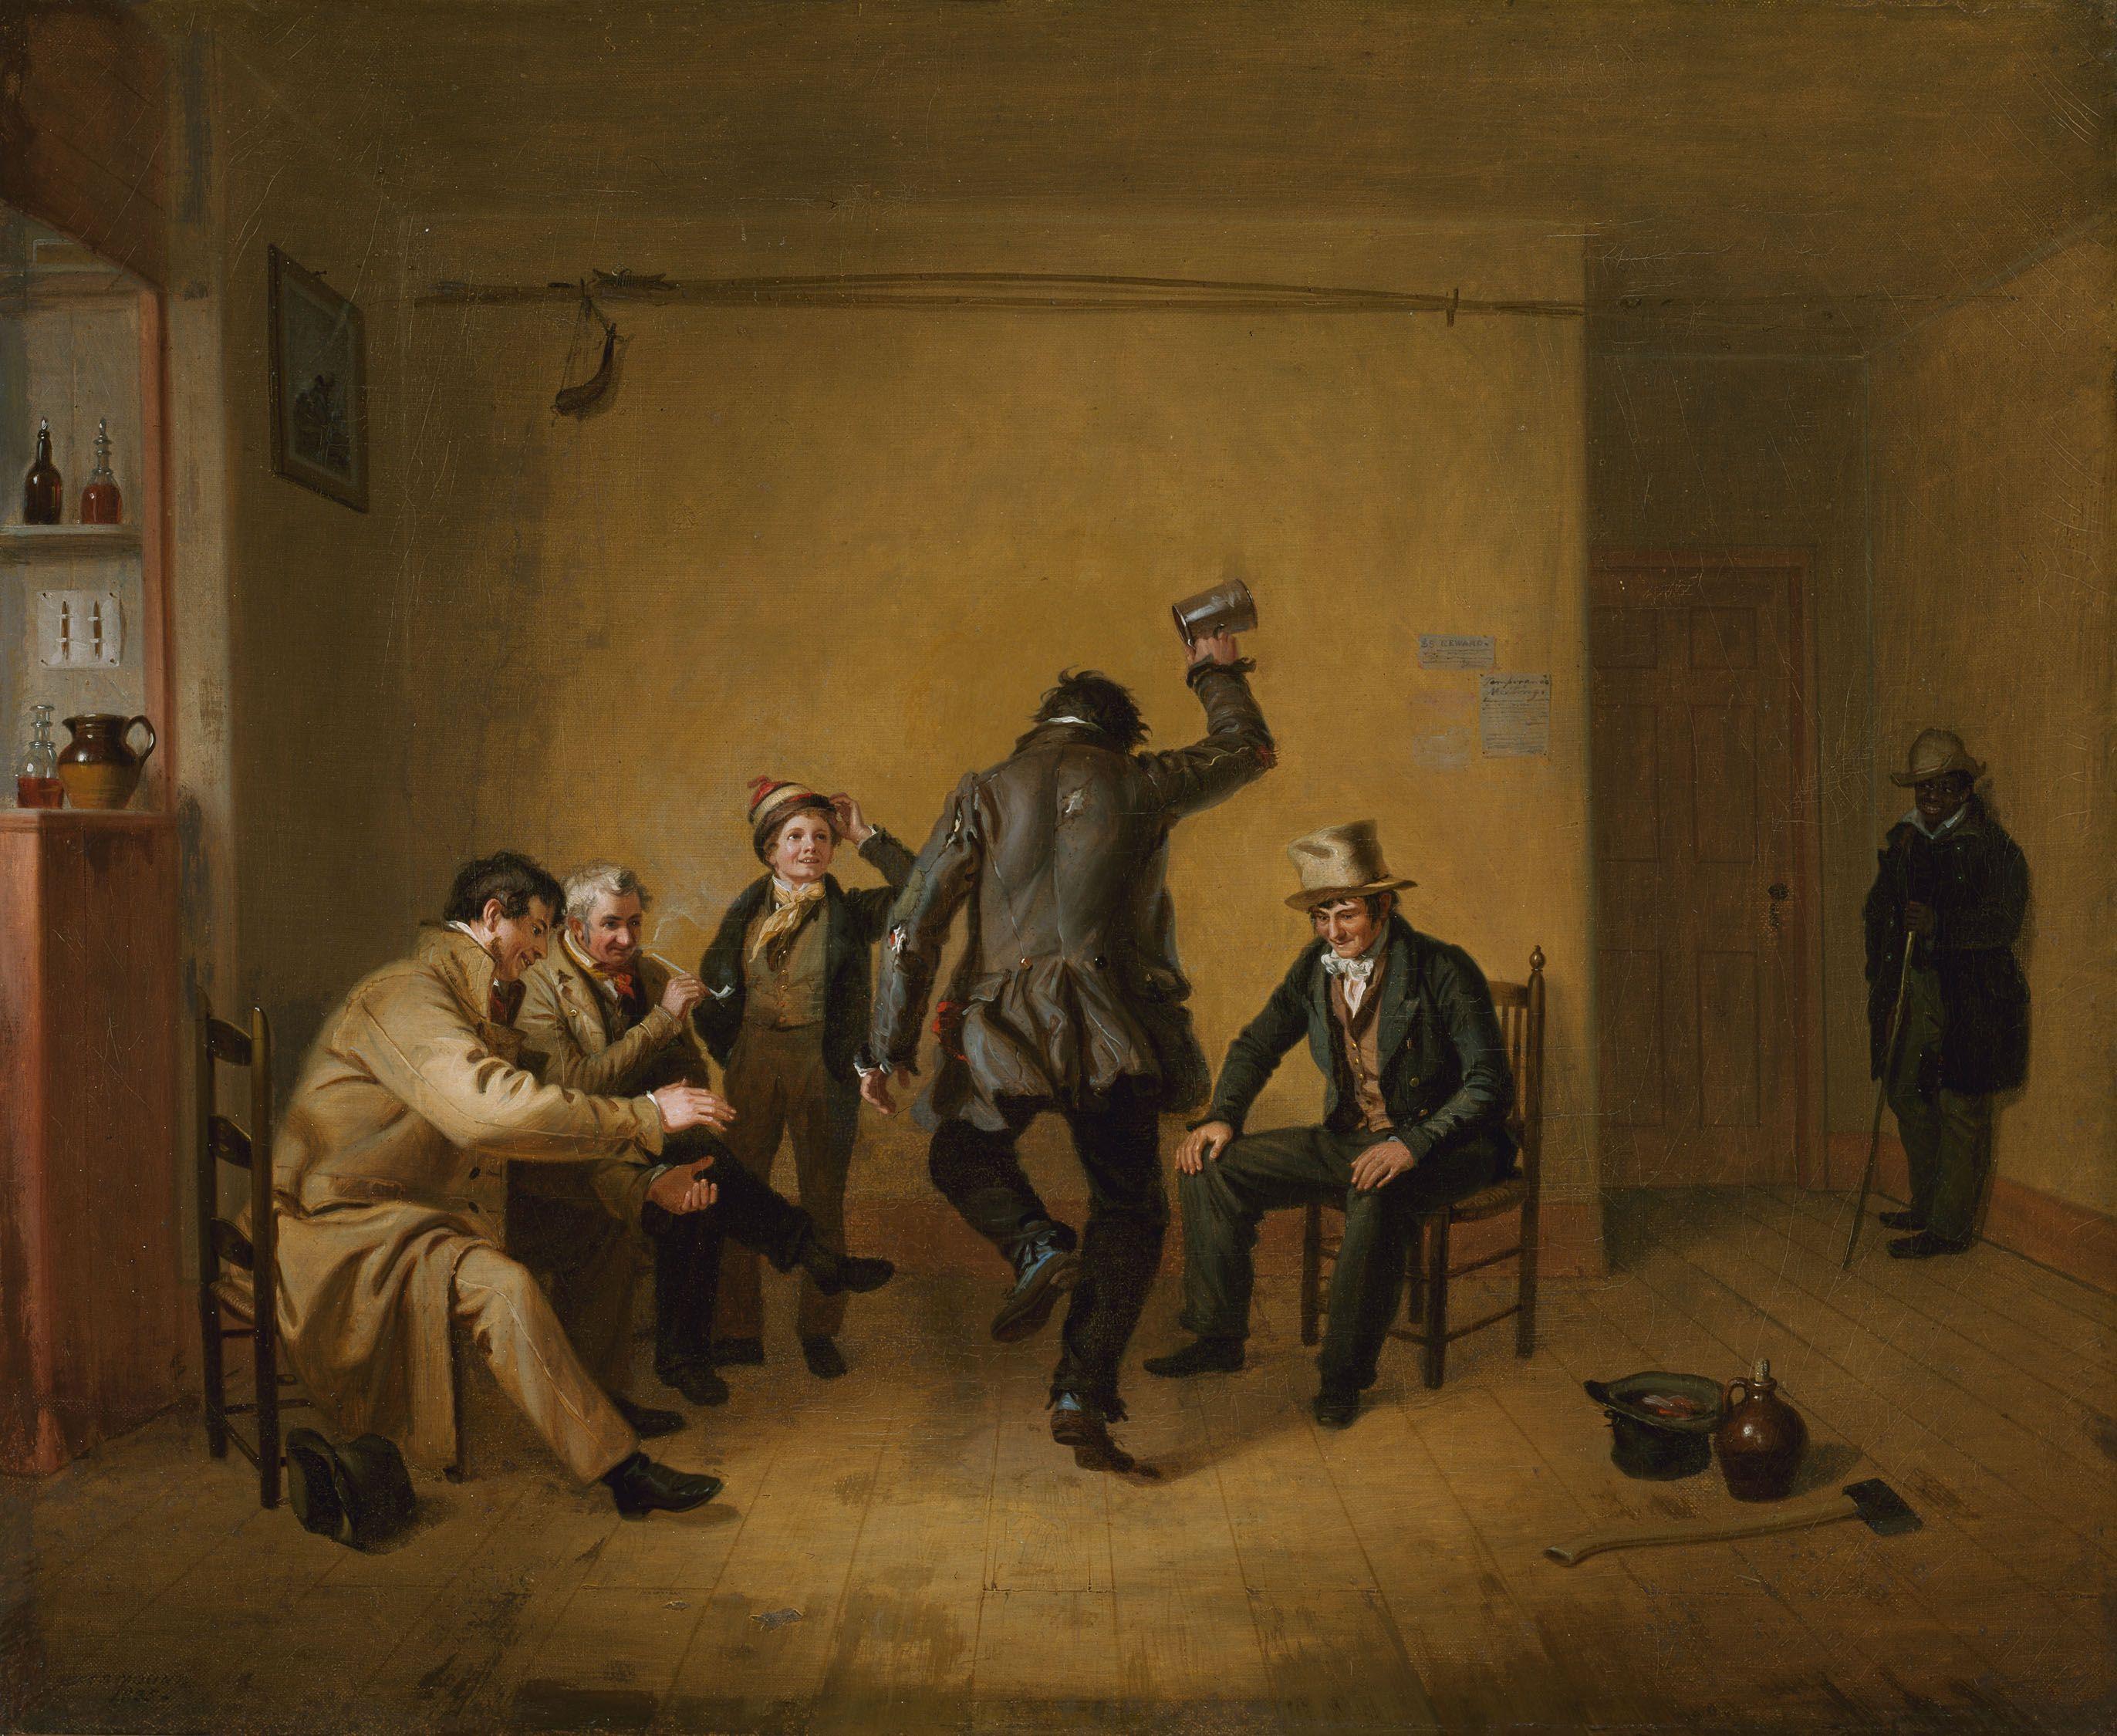 FileBarroom Scene William Sidney Mount 1835jpg